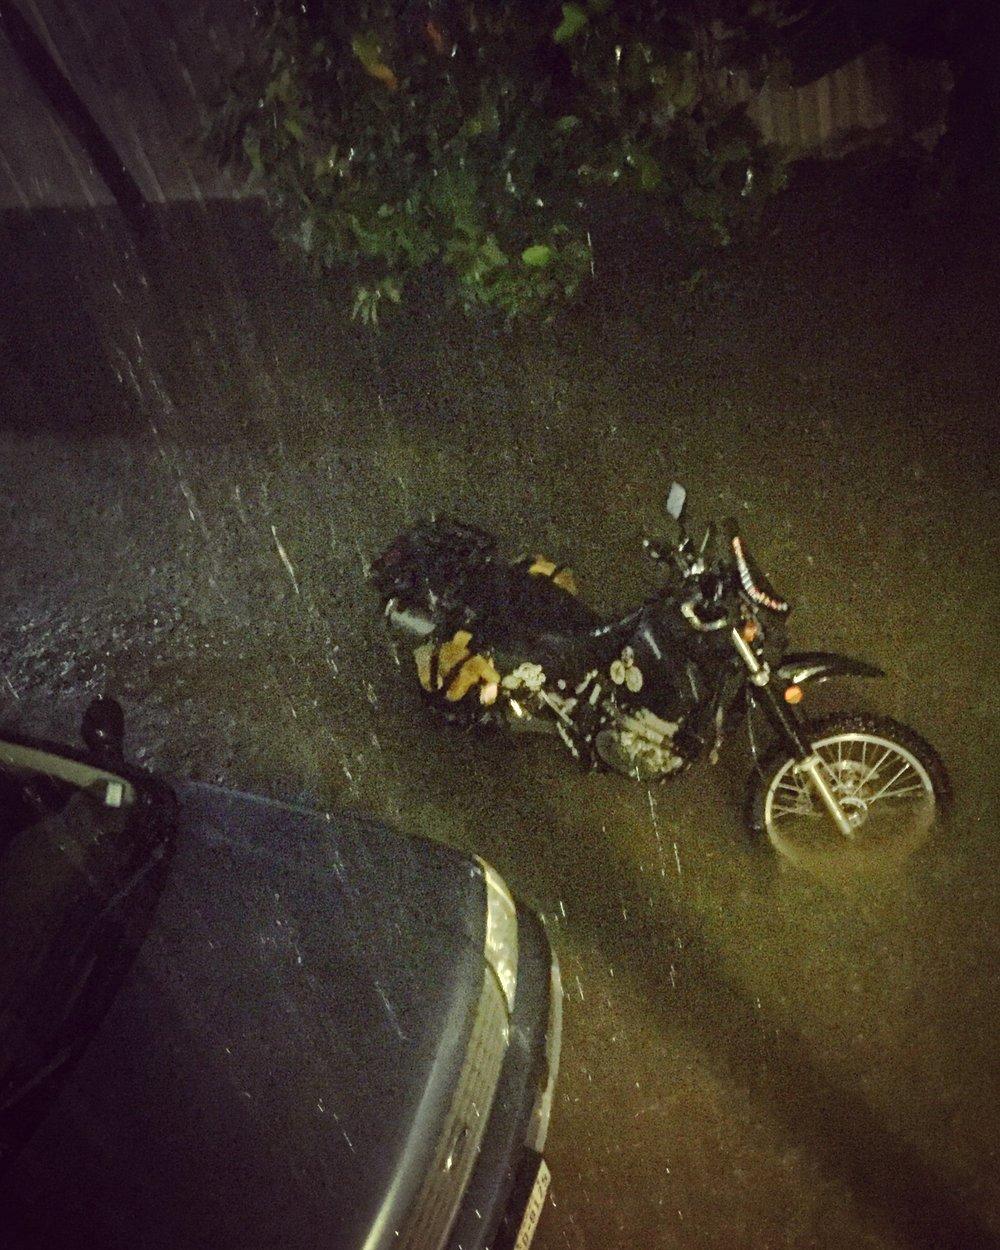 Chest Deep - https://rideapart.com/articles/hl-johnson-hurricane-harvey